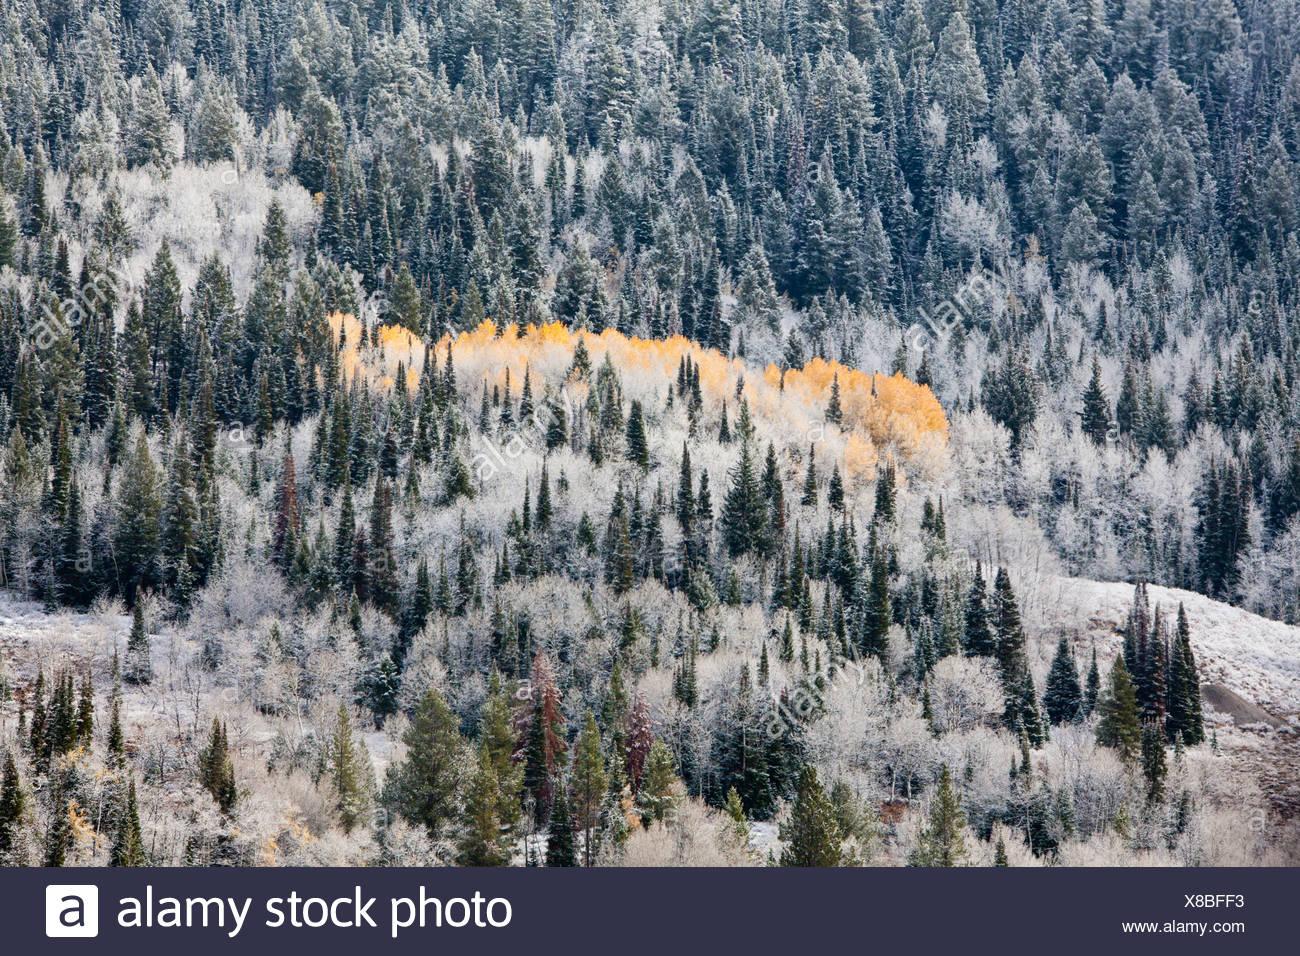 USA, USA, Amerika, Wyoming, Herbst, kalt, Kiefer, Holz, gelbe Blätter, Bäume, Schnee Stockbild